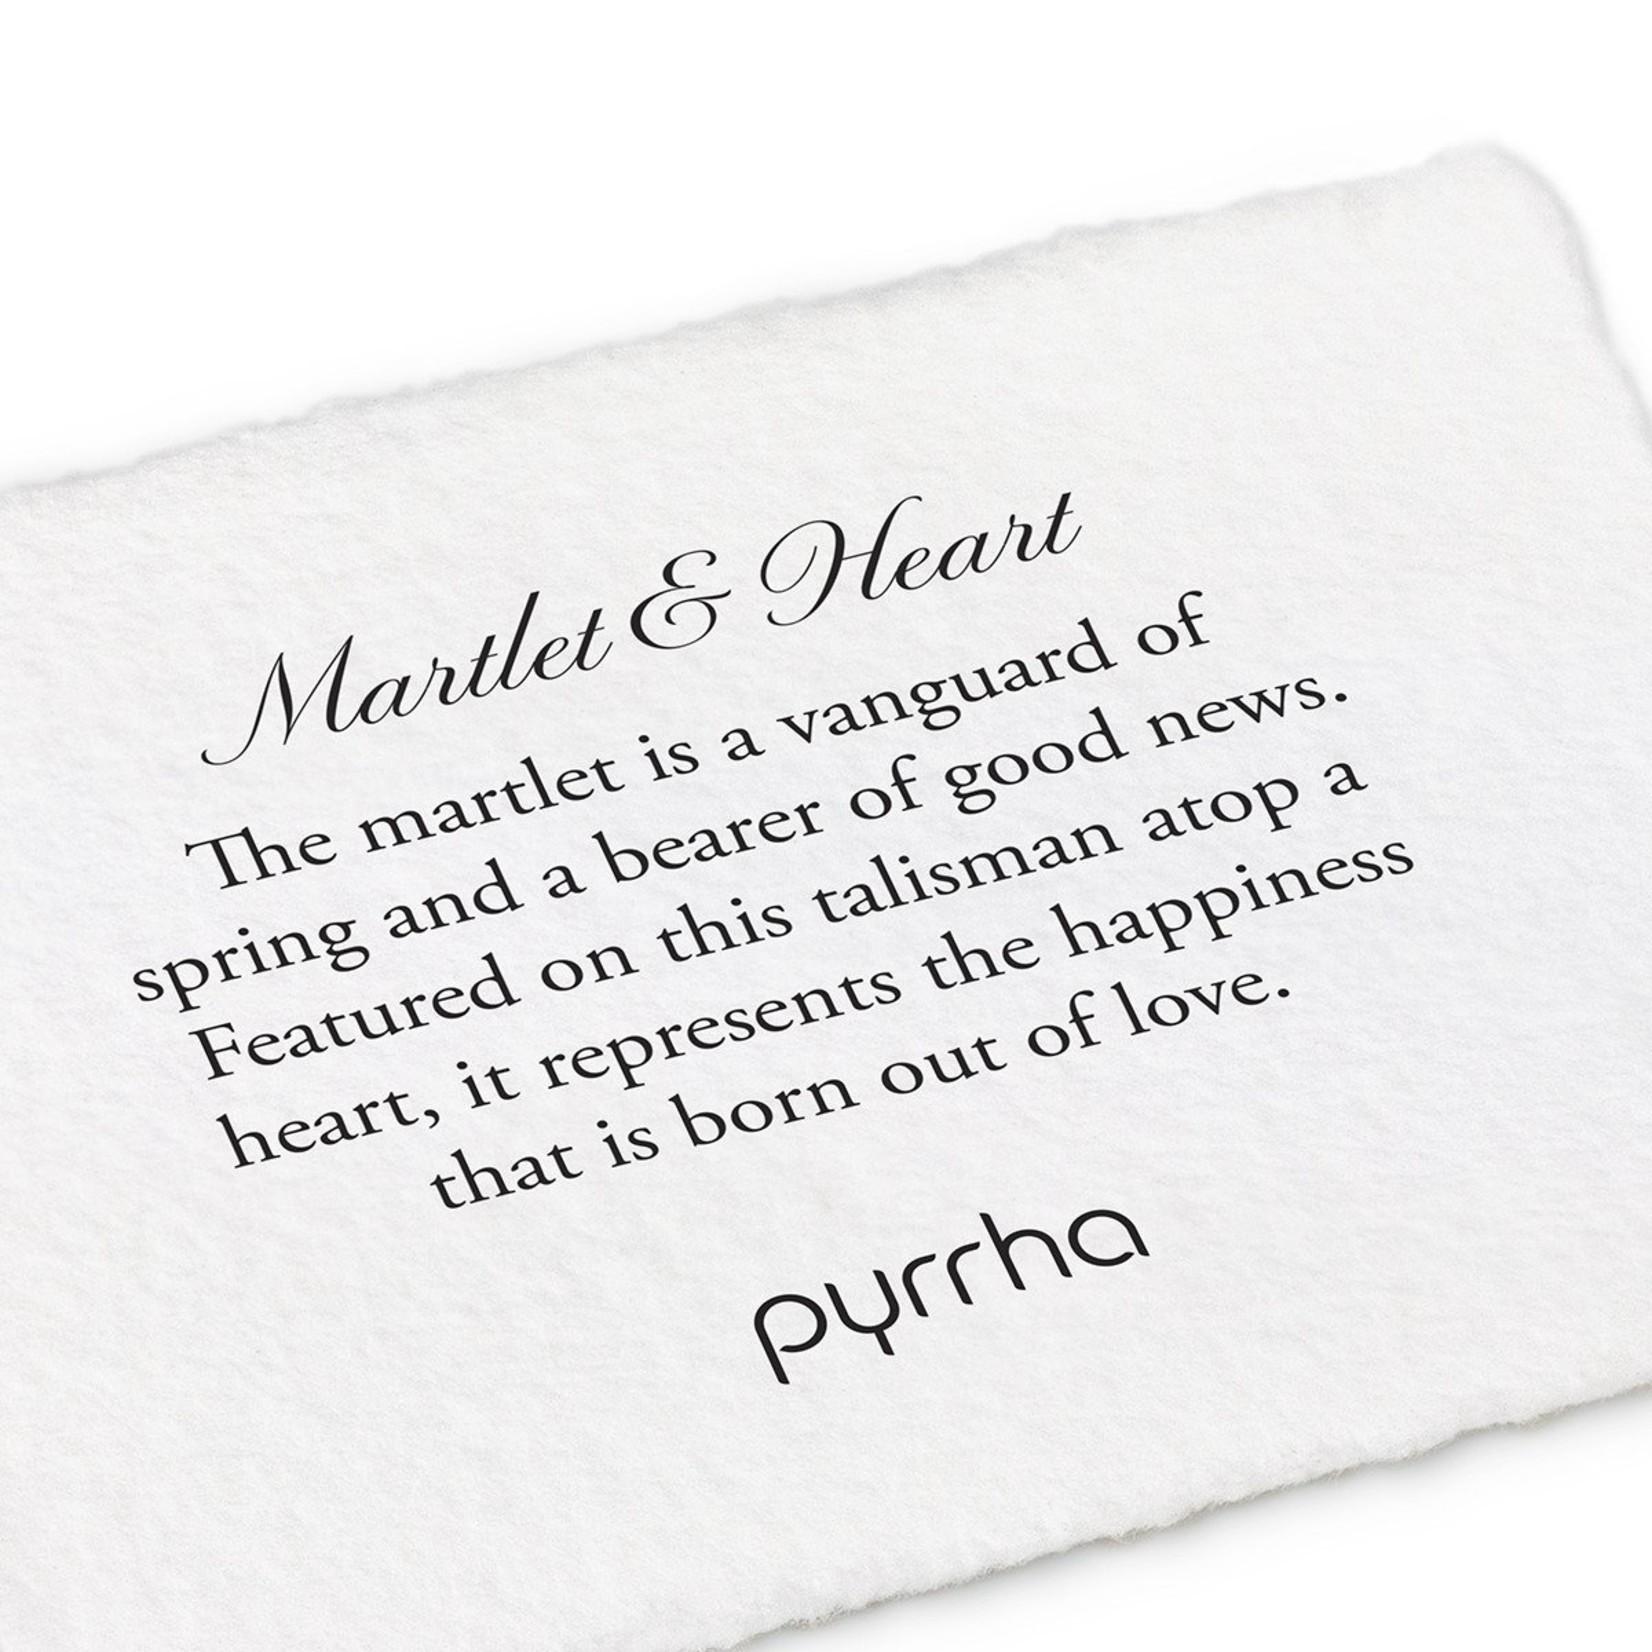 Pyrrha Martlet & Heart Signature Talisman